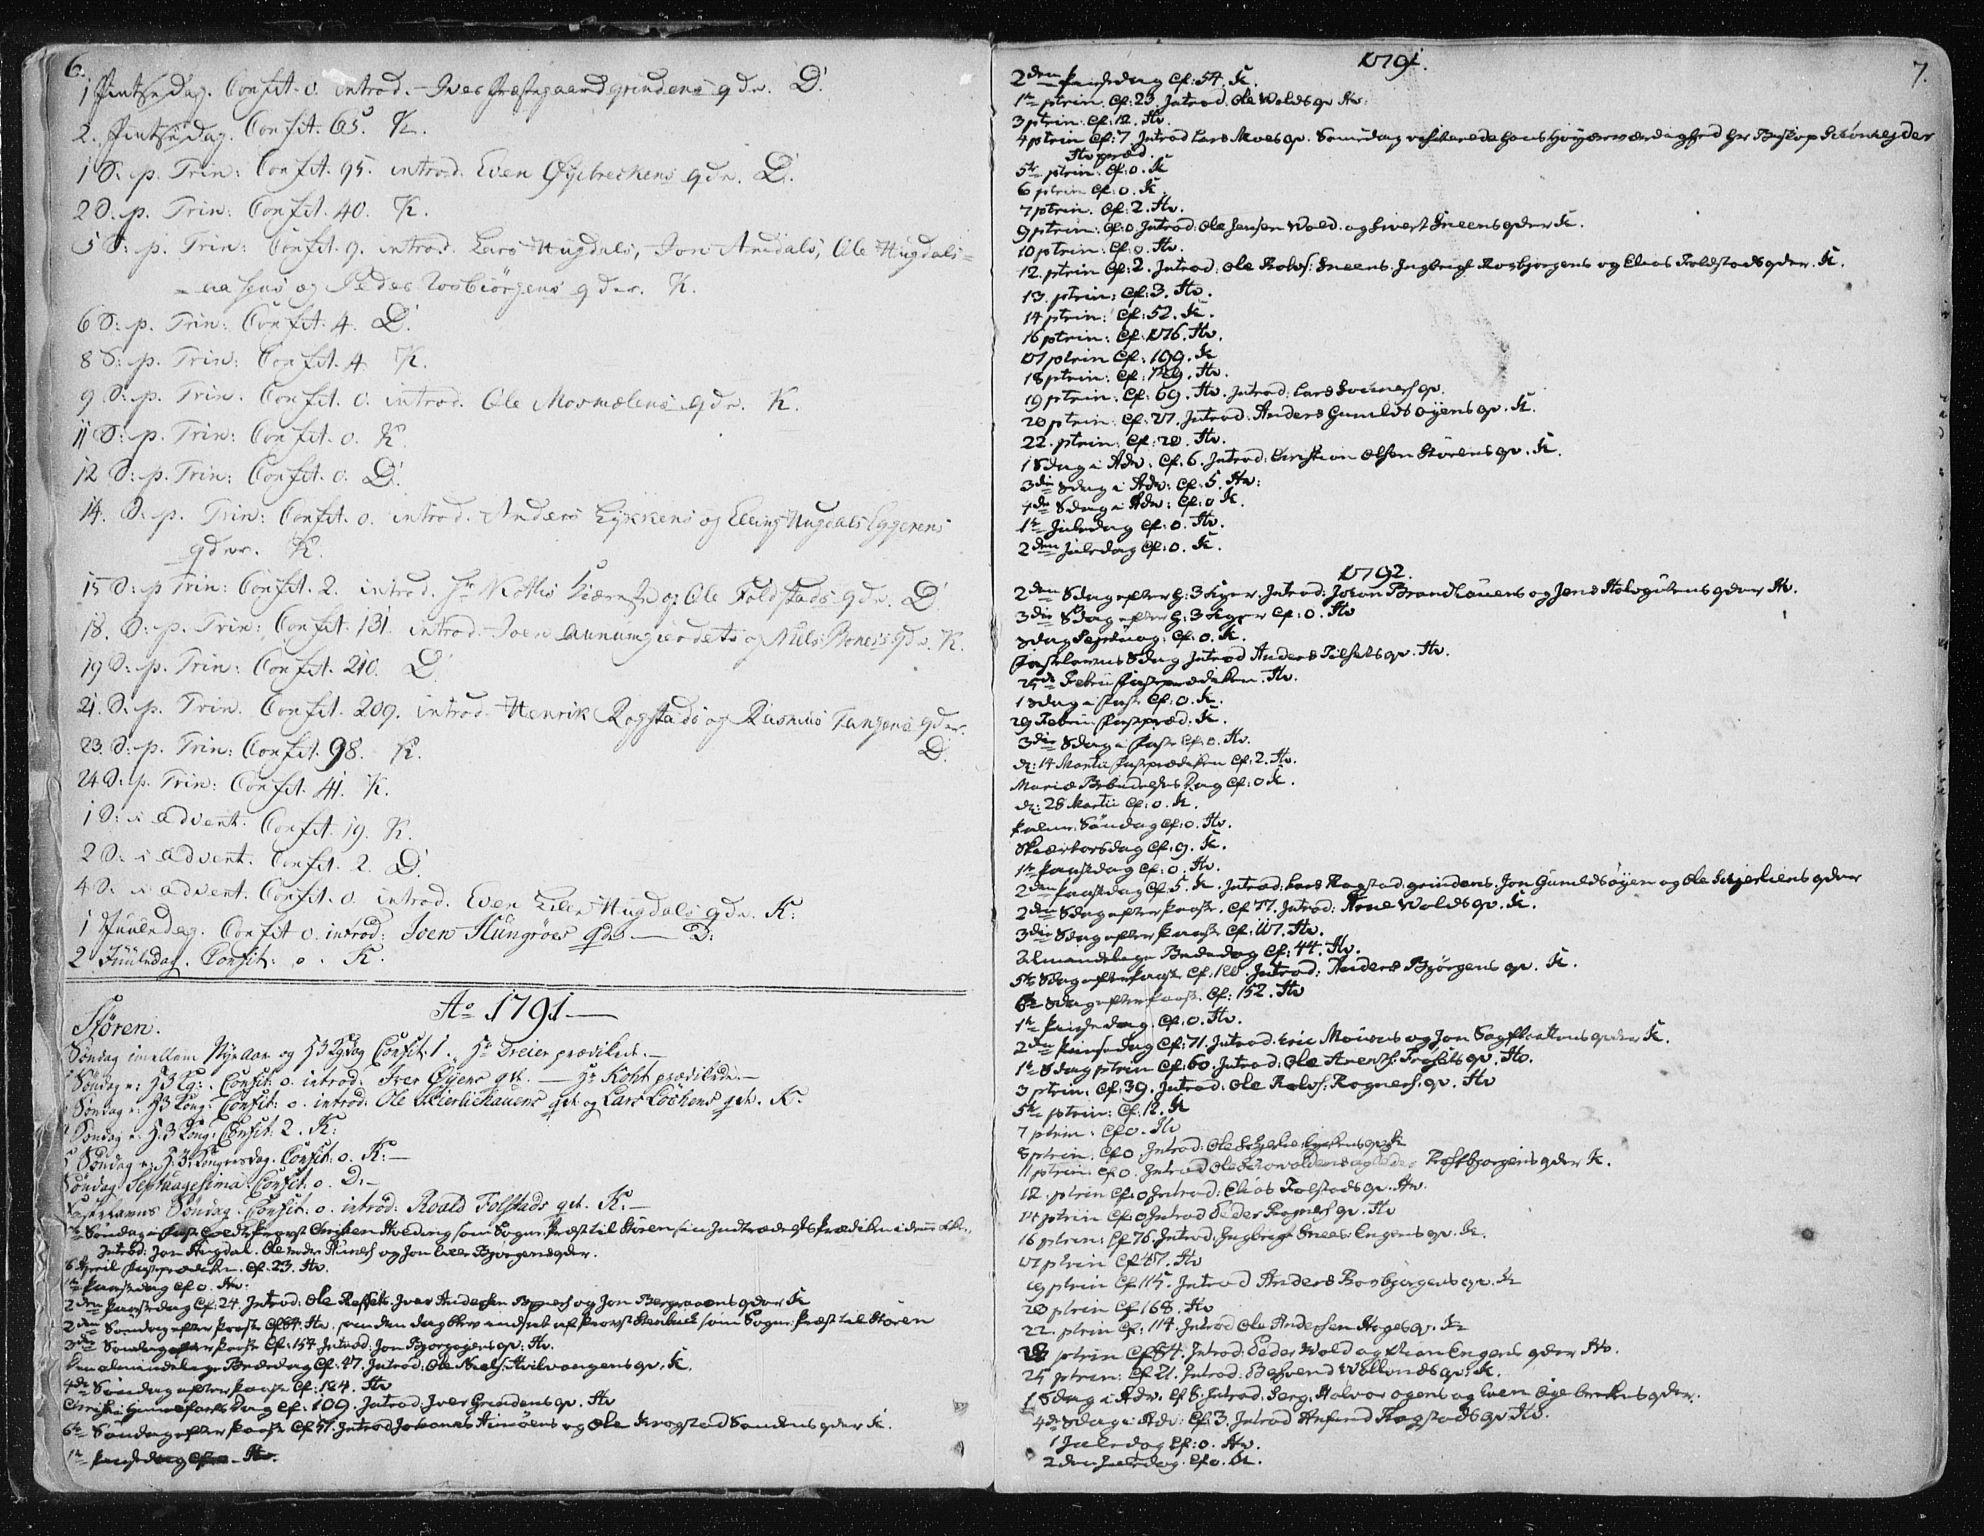 SAT, Ministerialprotokoller, klokkerbøker og fødselsregistre - Sør-Trøndelag, 687/L0992: Parish register (official) no. 687A03 /1, 1788-1815, p. 6-7